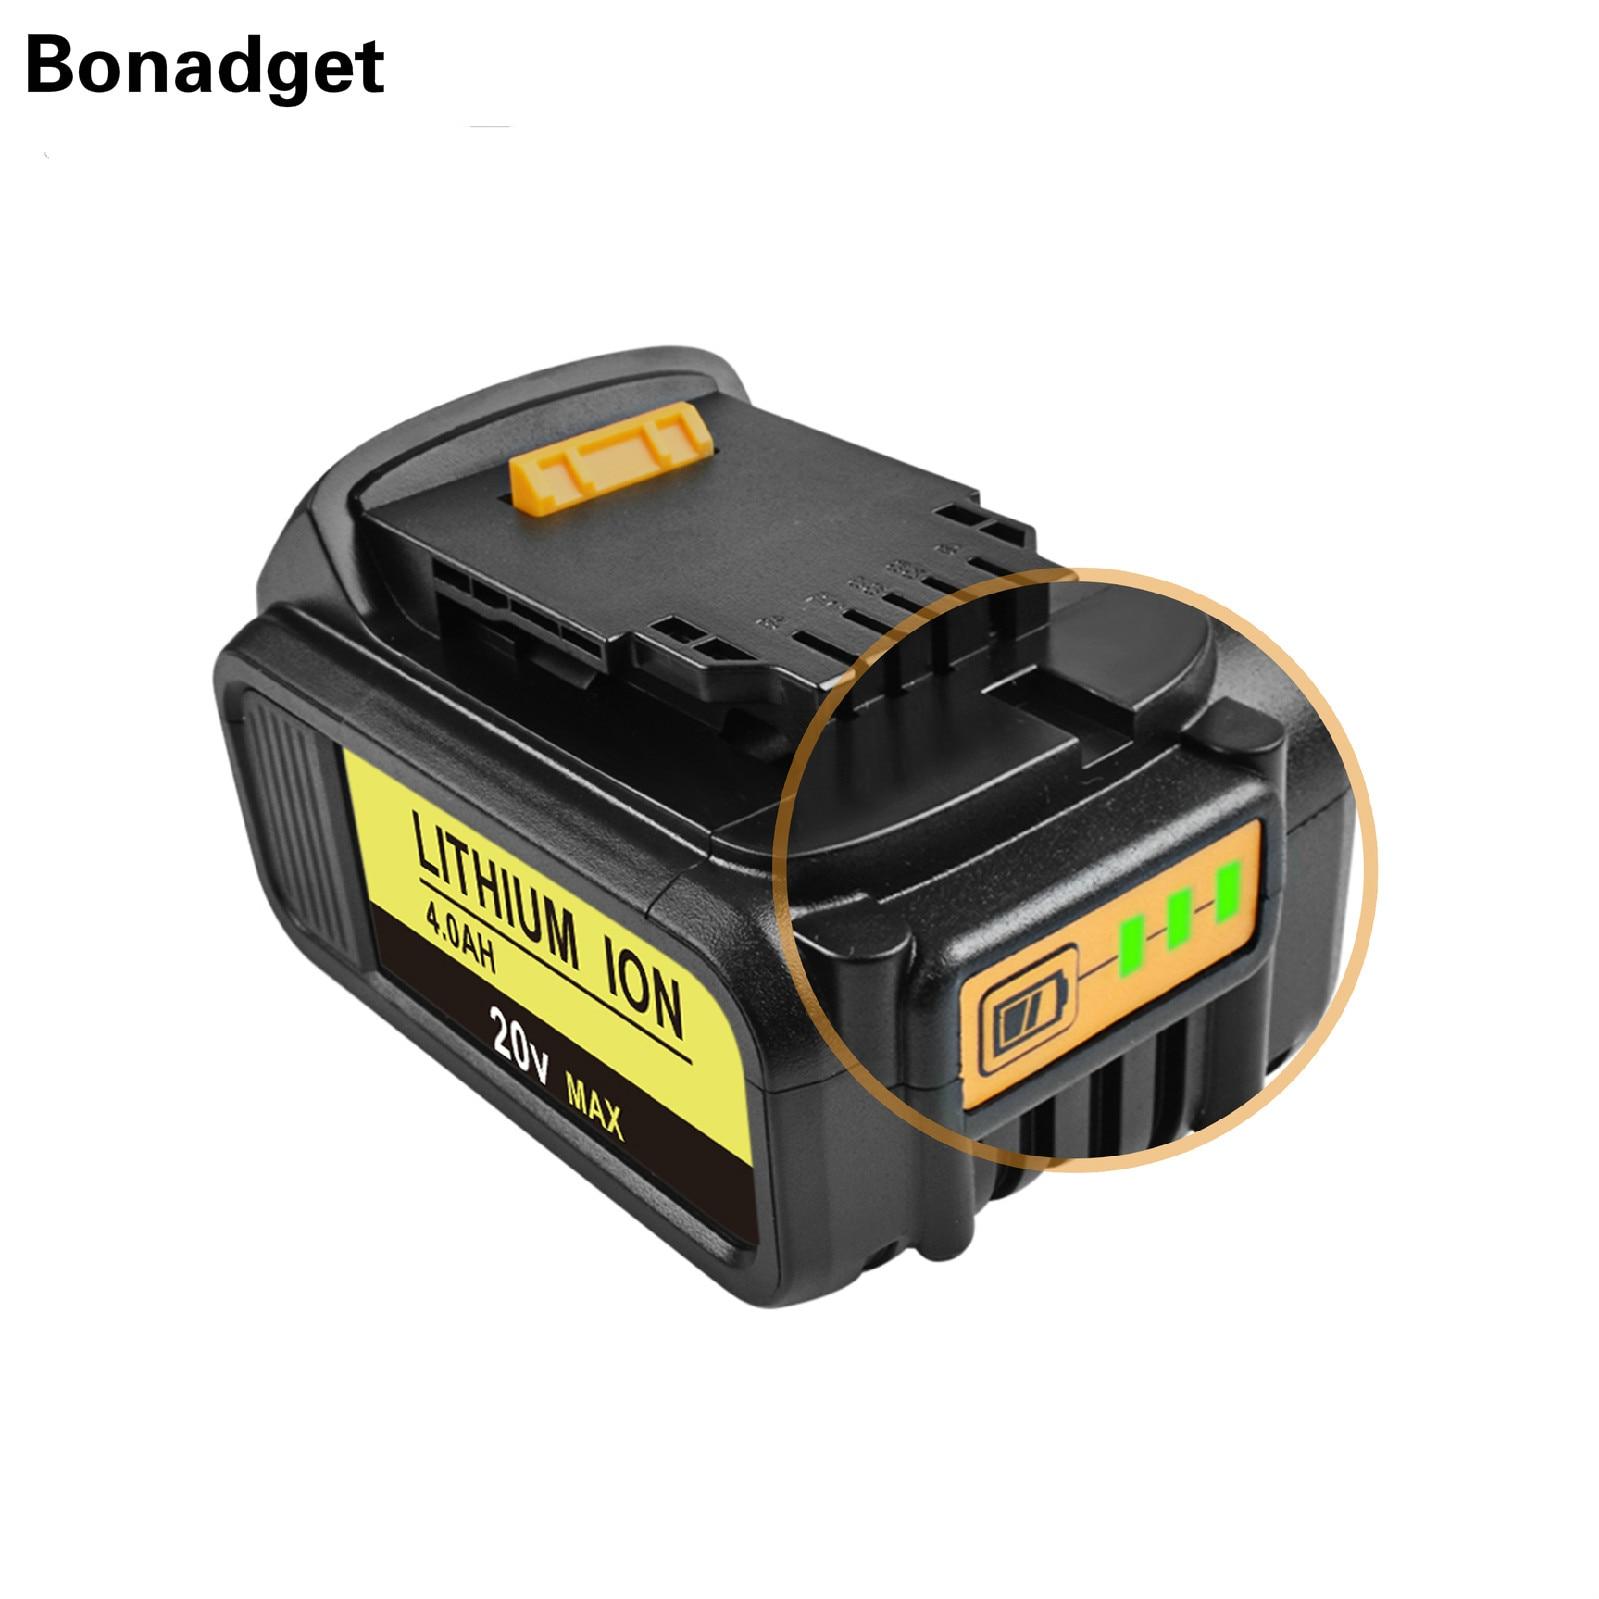 Bonadget para DeWalt 20V 4.0Ah DCB200 recargable de DCB181 DCB182 DCB204 DCB101 DCD996 DCF885 batería de herramientas eléctricas